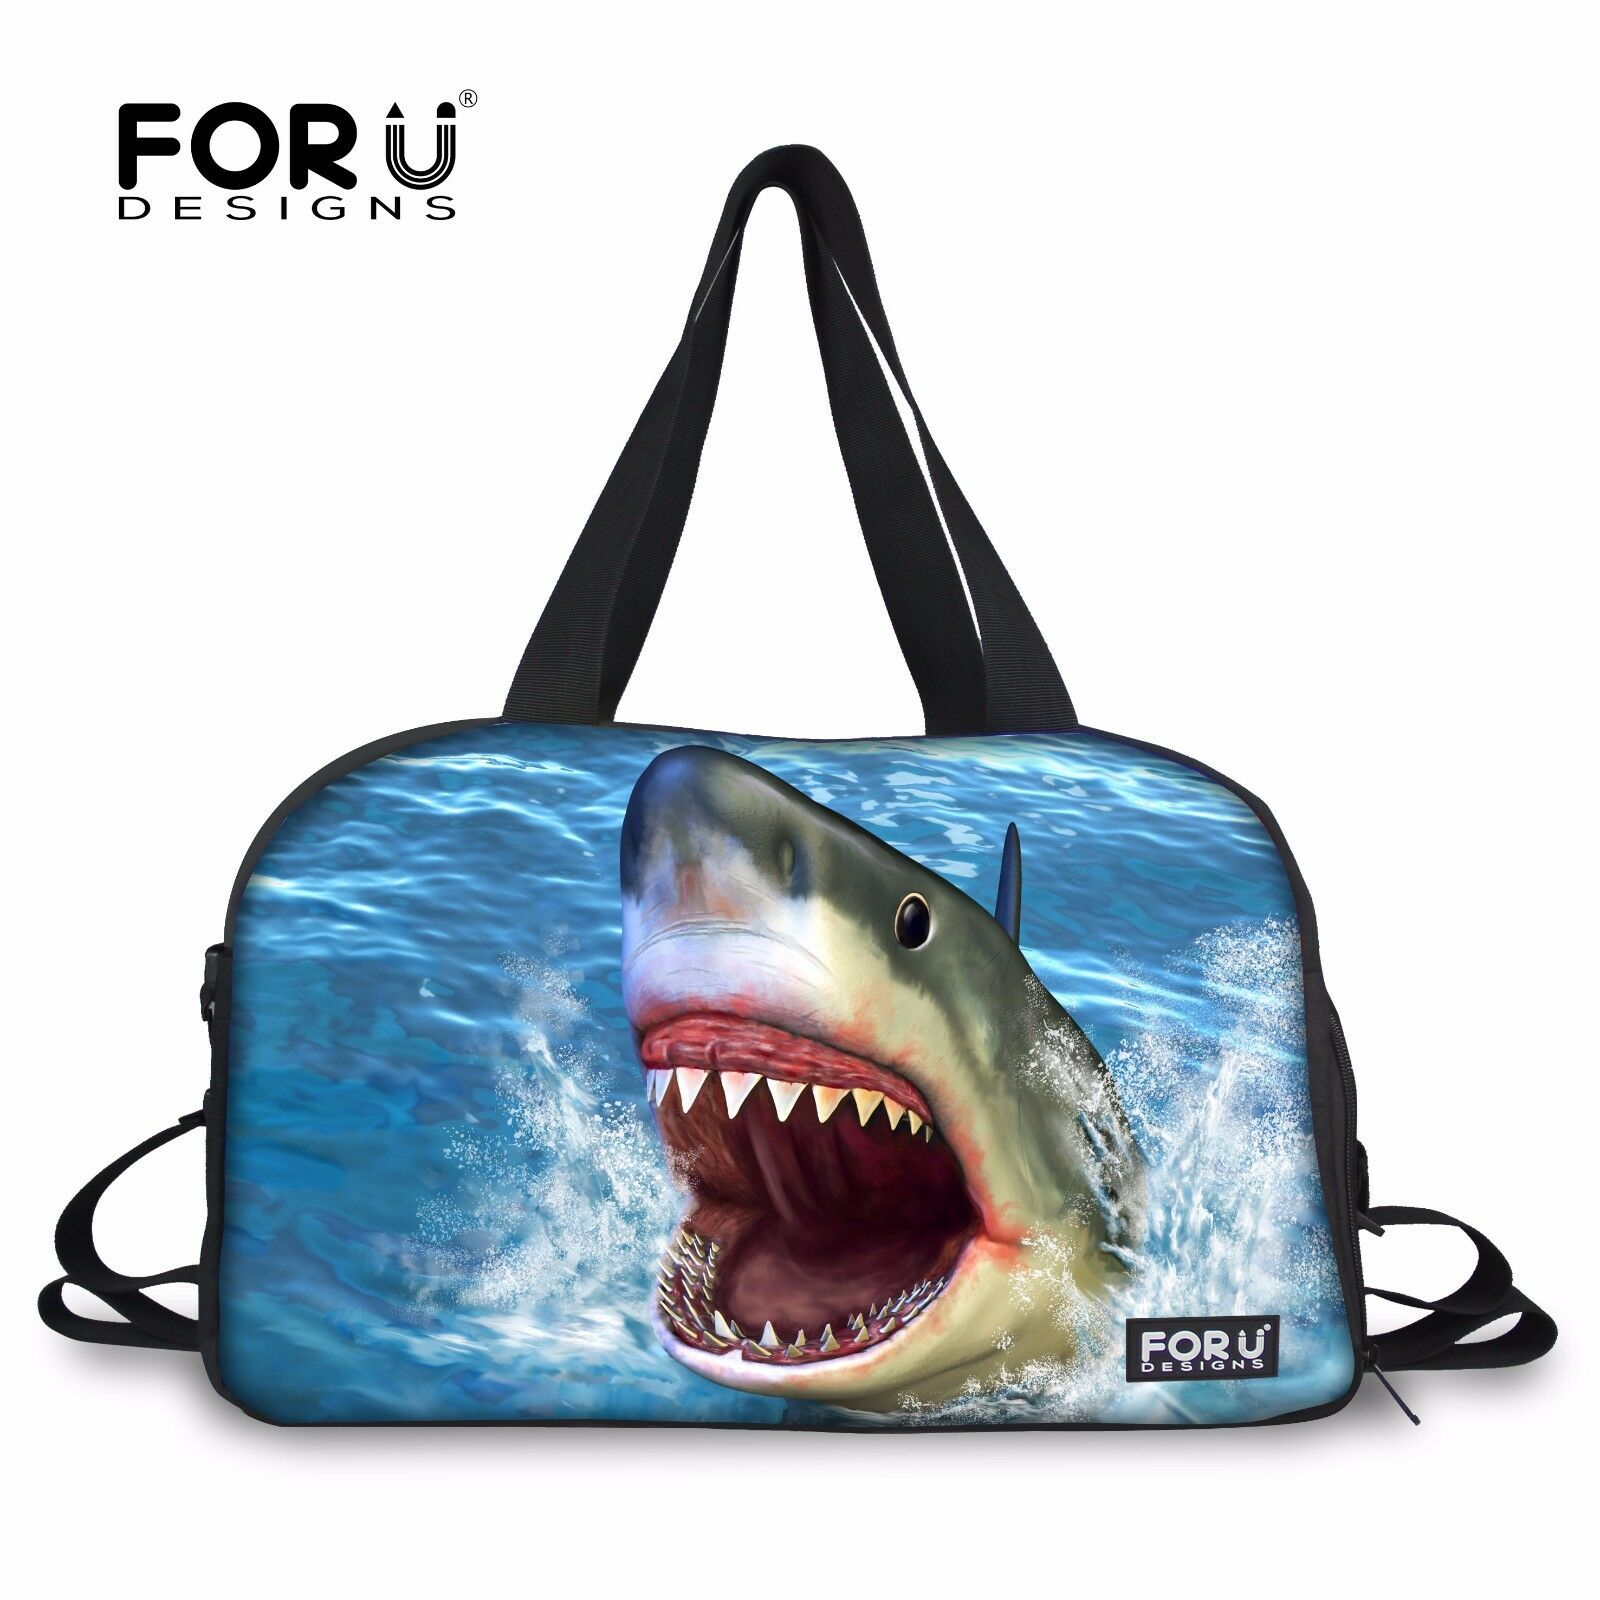 Animal Shark Duffle Sport Tote Yoga Fitness Travel Gym Bag Handbag Women Men